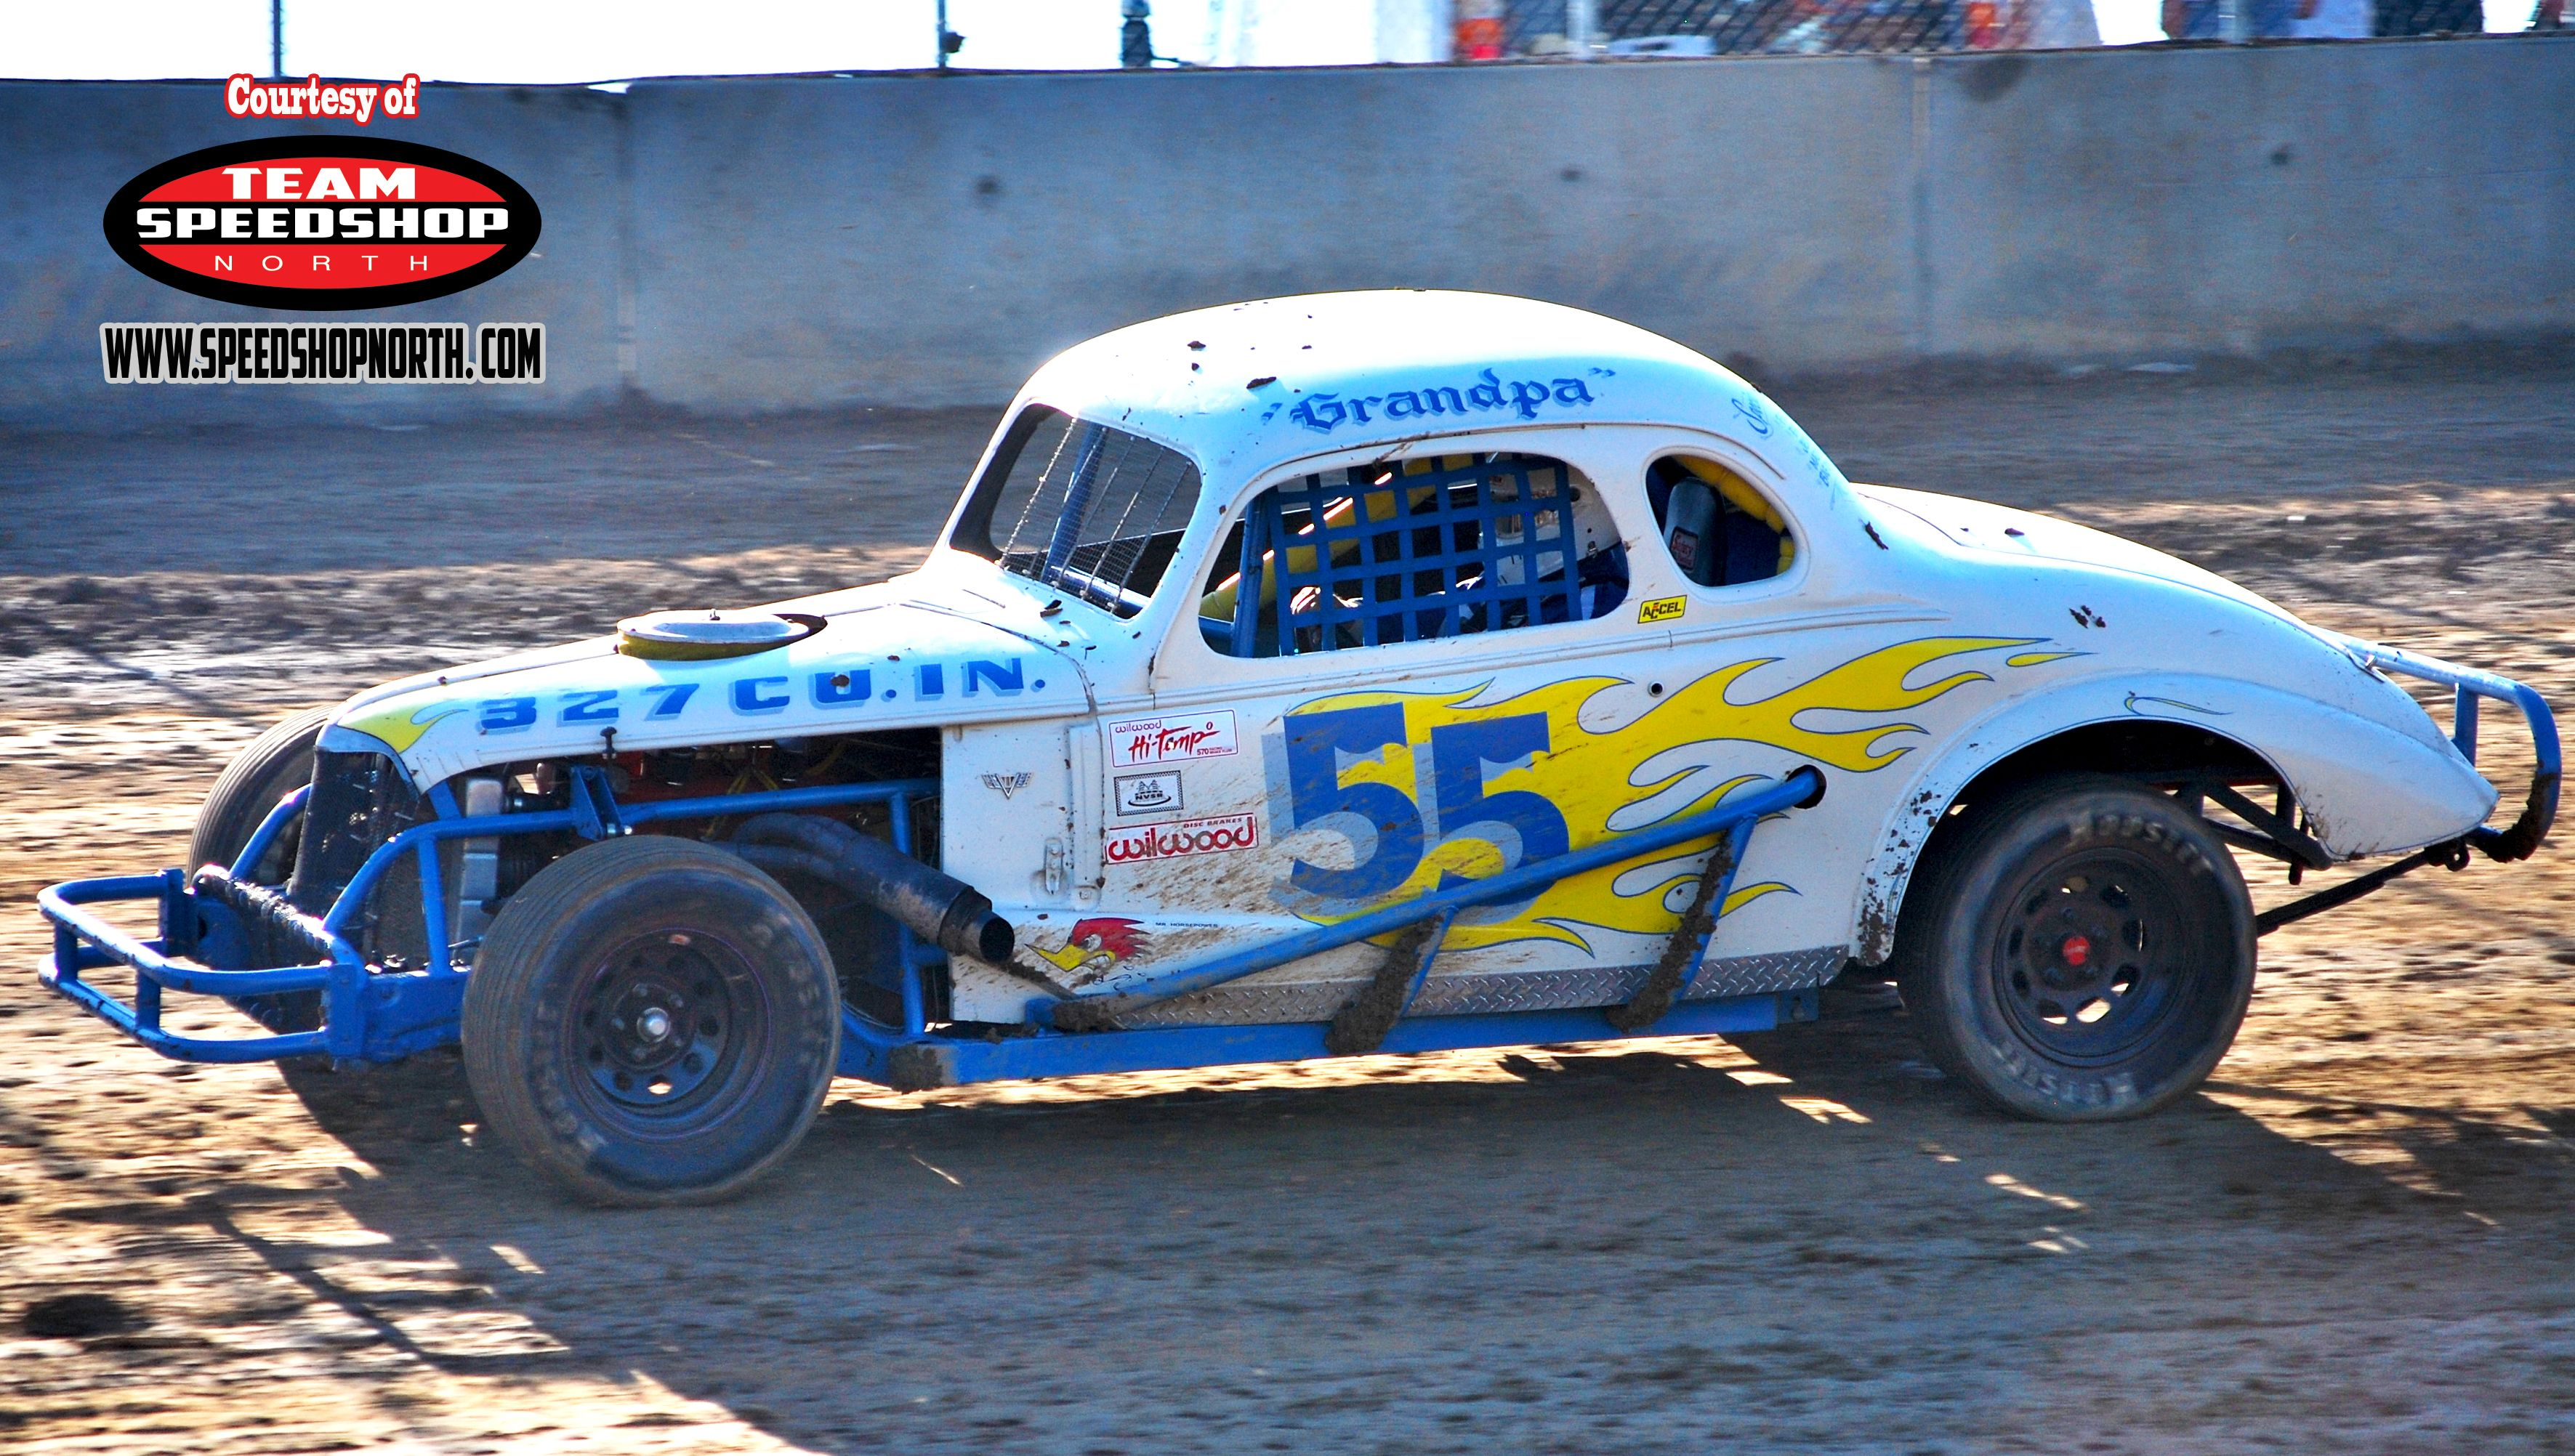 Vintage Dirt Track Race Car Pictures Car Canyon